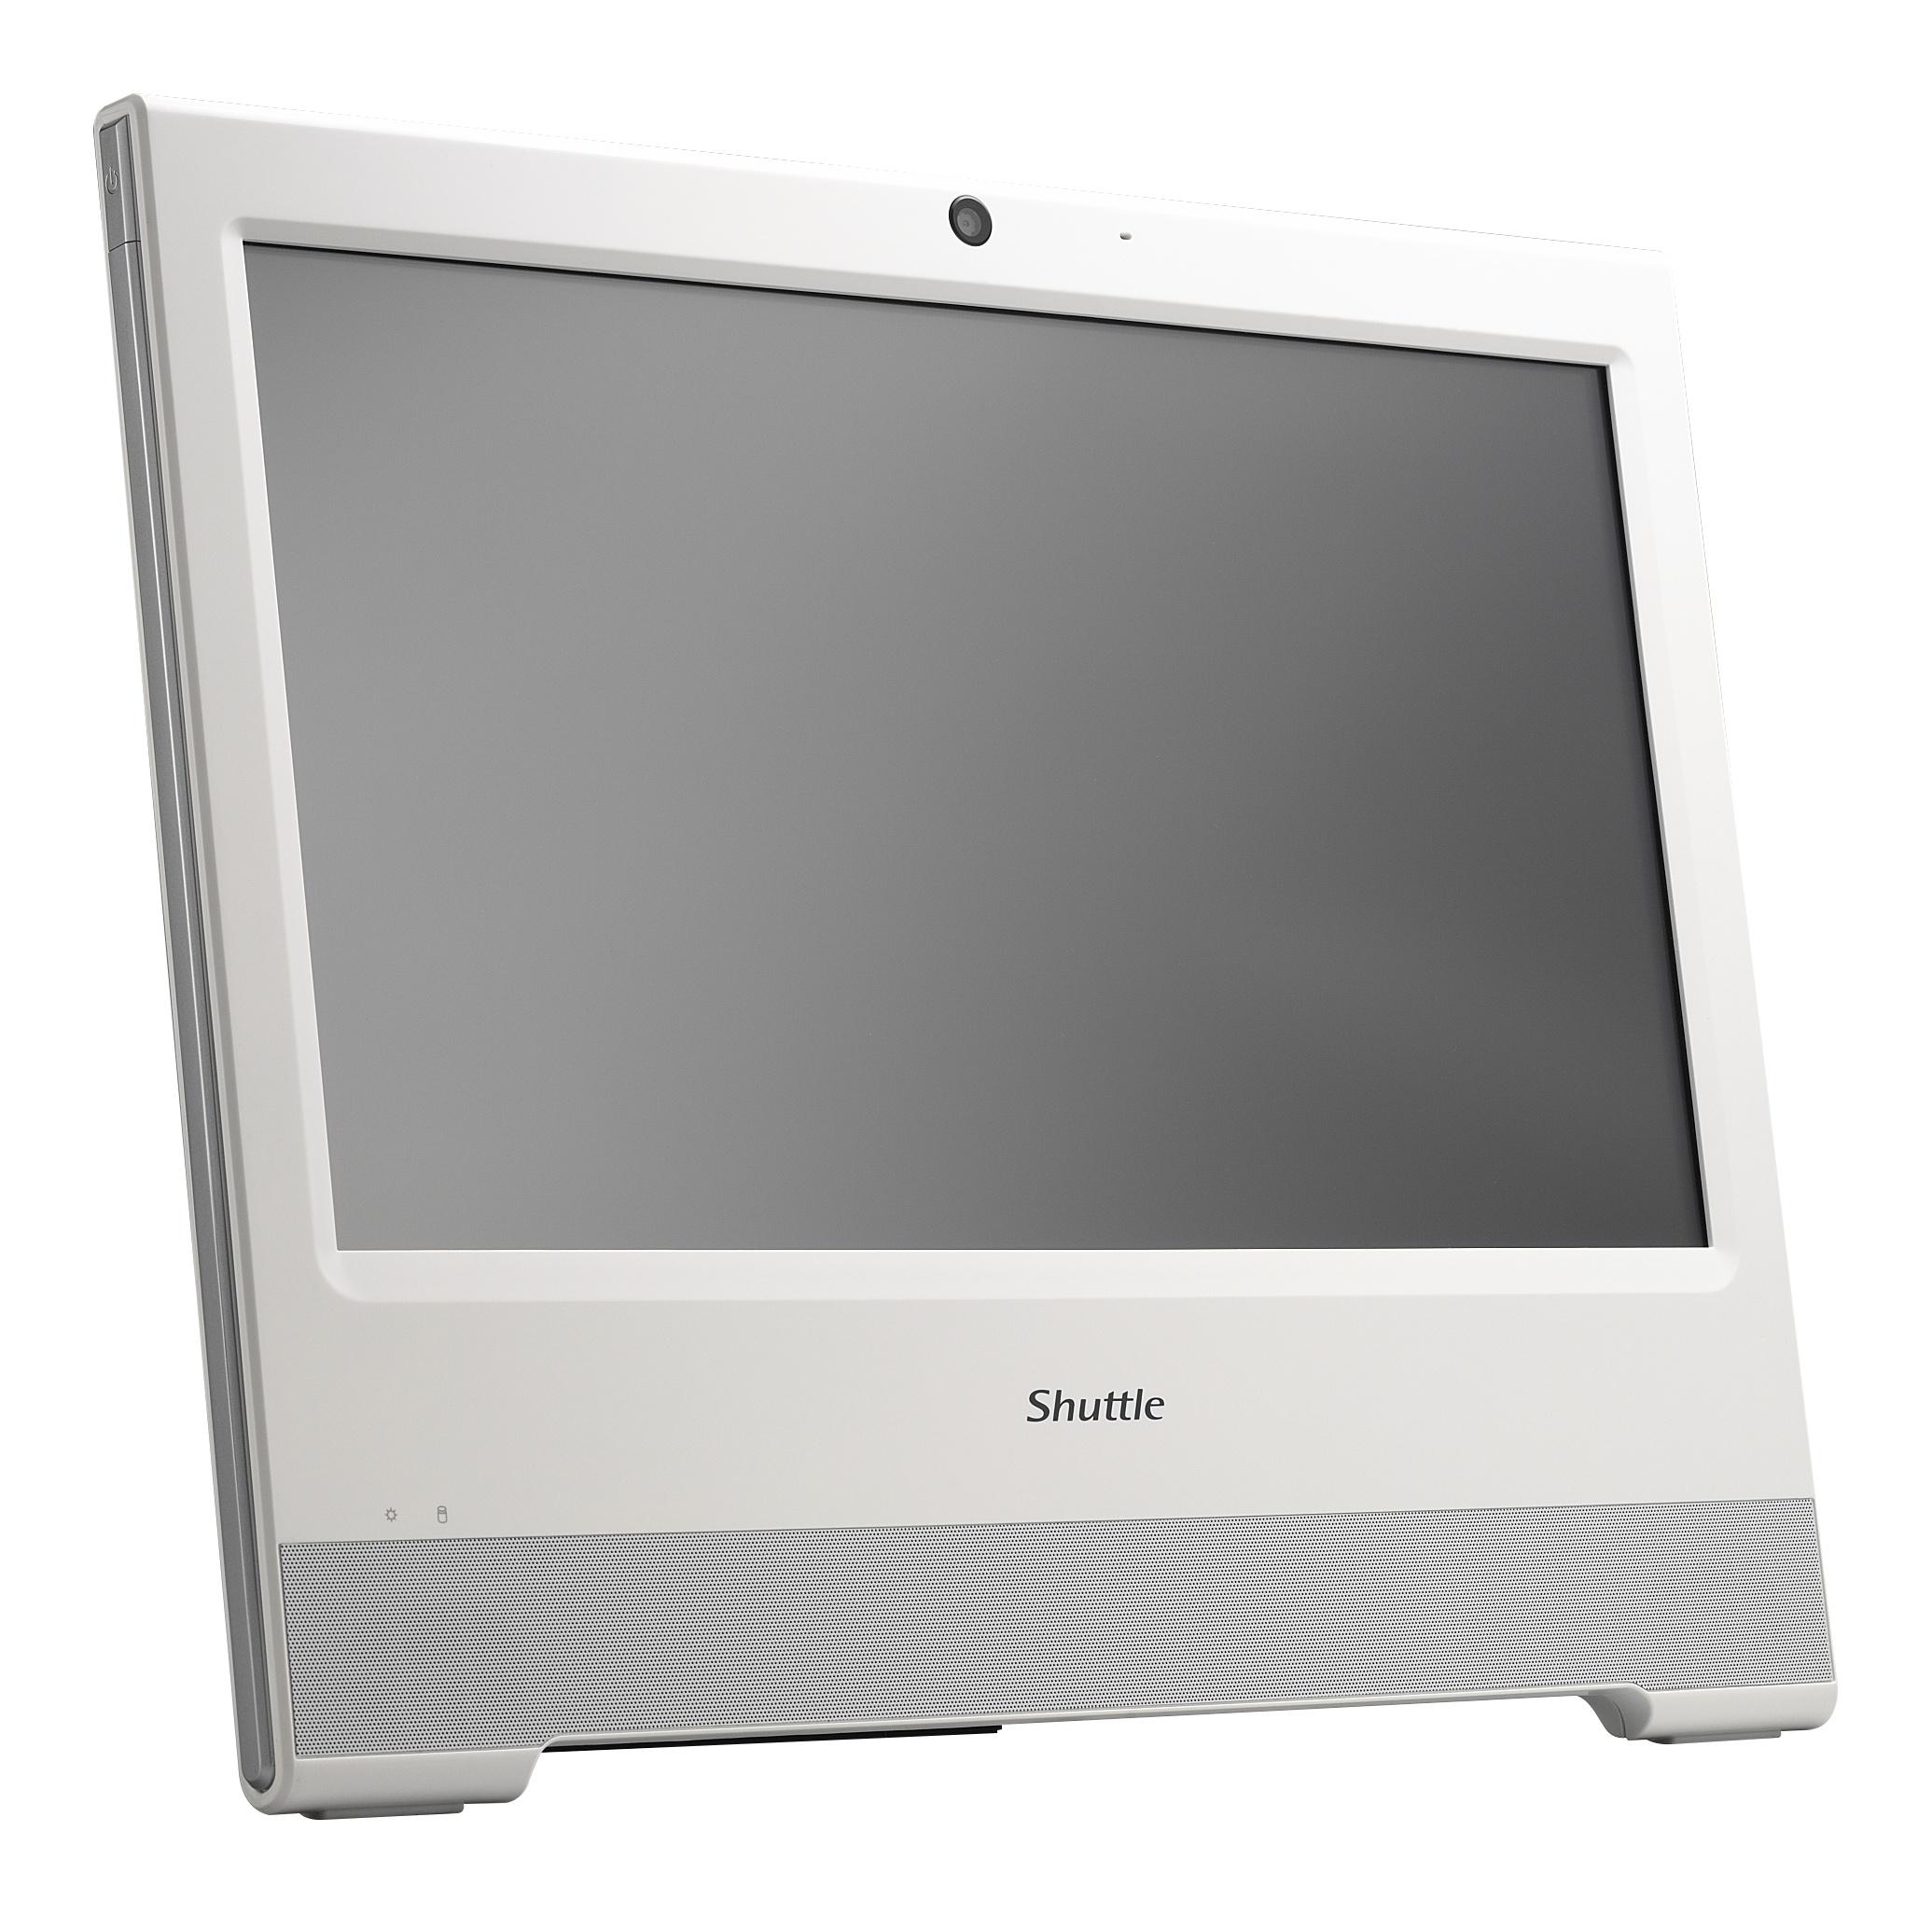 Shuttle XPC X5060XA 1.8GHz 3865U 15.6Zoll 1366 x 768Pixel Touchscreen Weiß All-in-One-PC